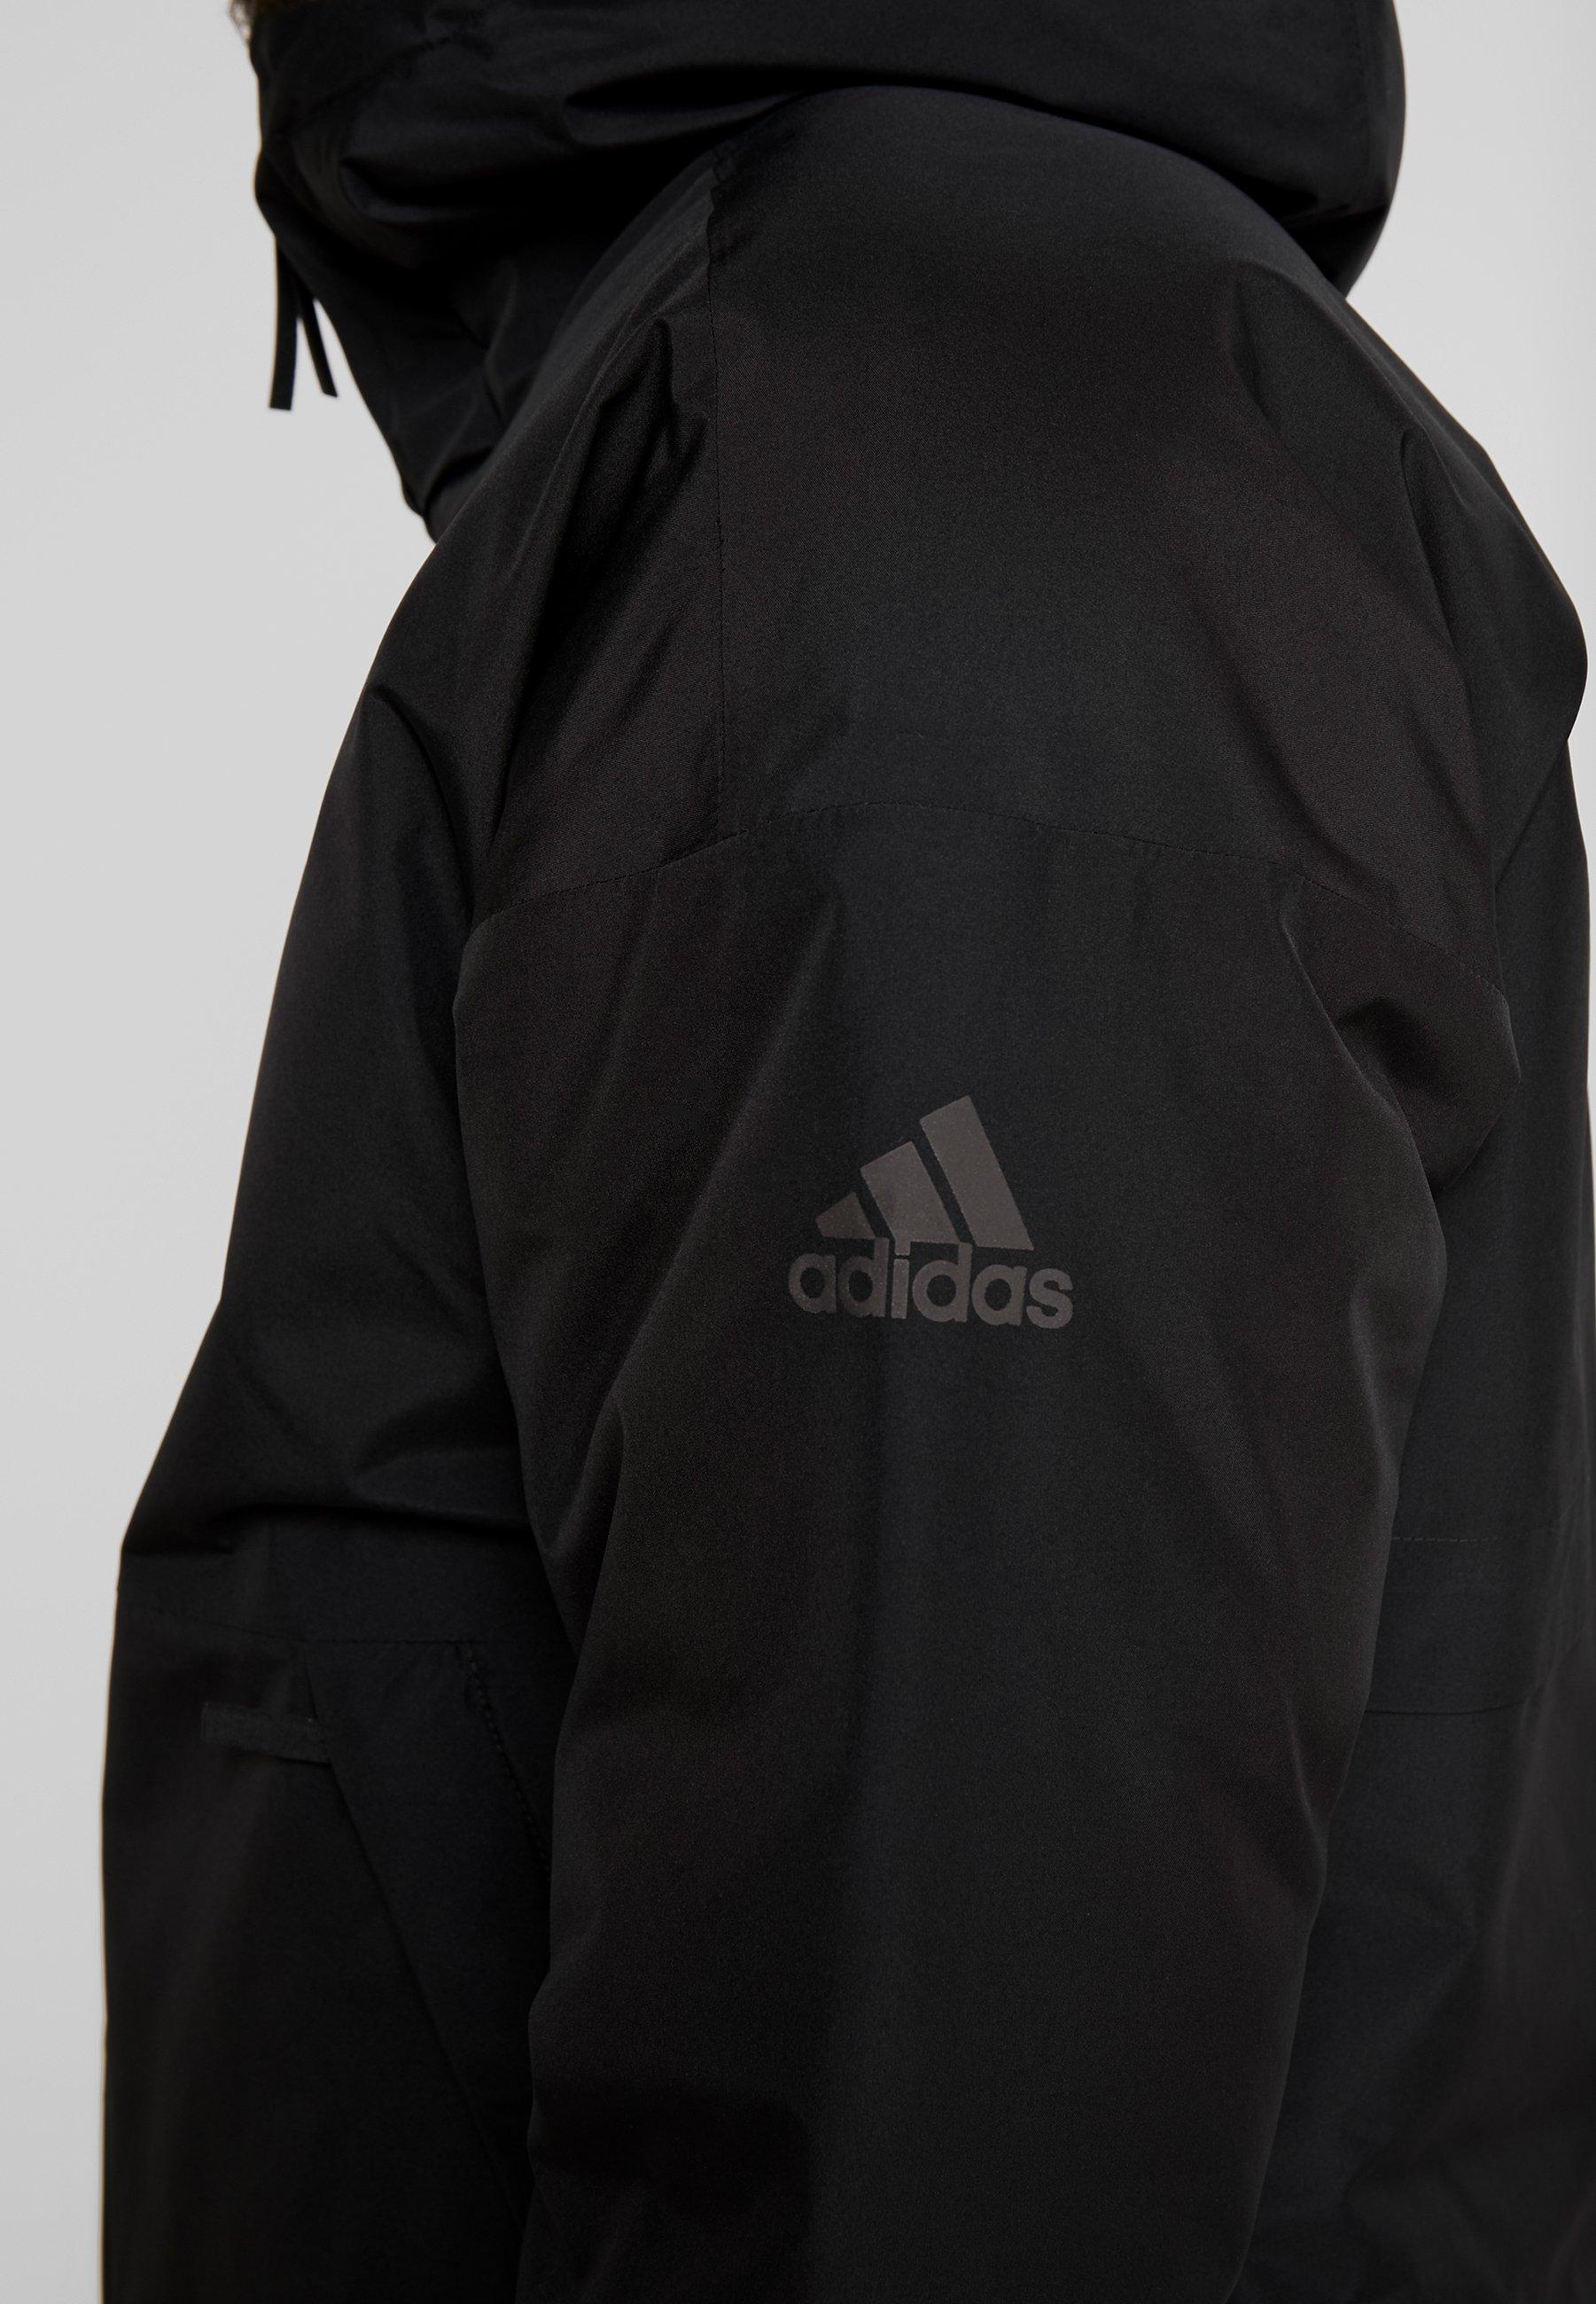 Adidas Performance Urban Insulated Rain Jacket - Regenjacke / Wasserabweisende Jacke Black